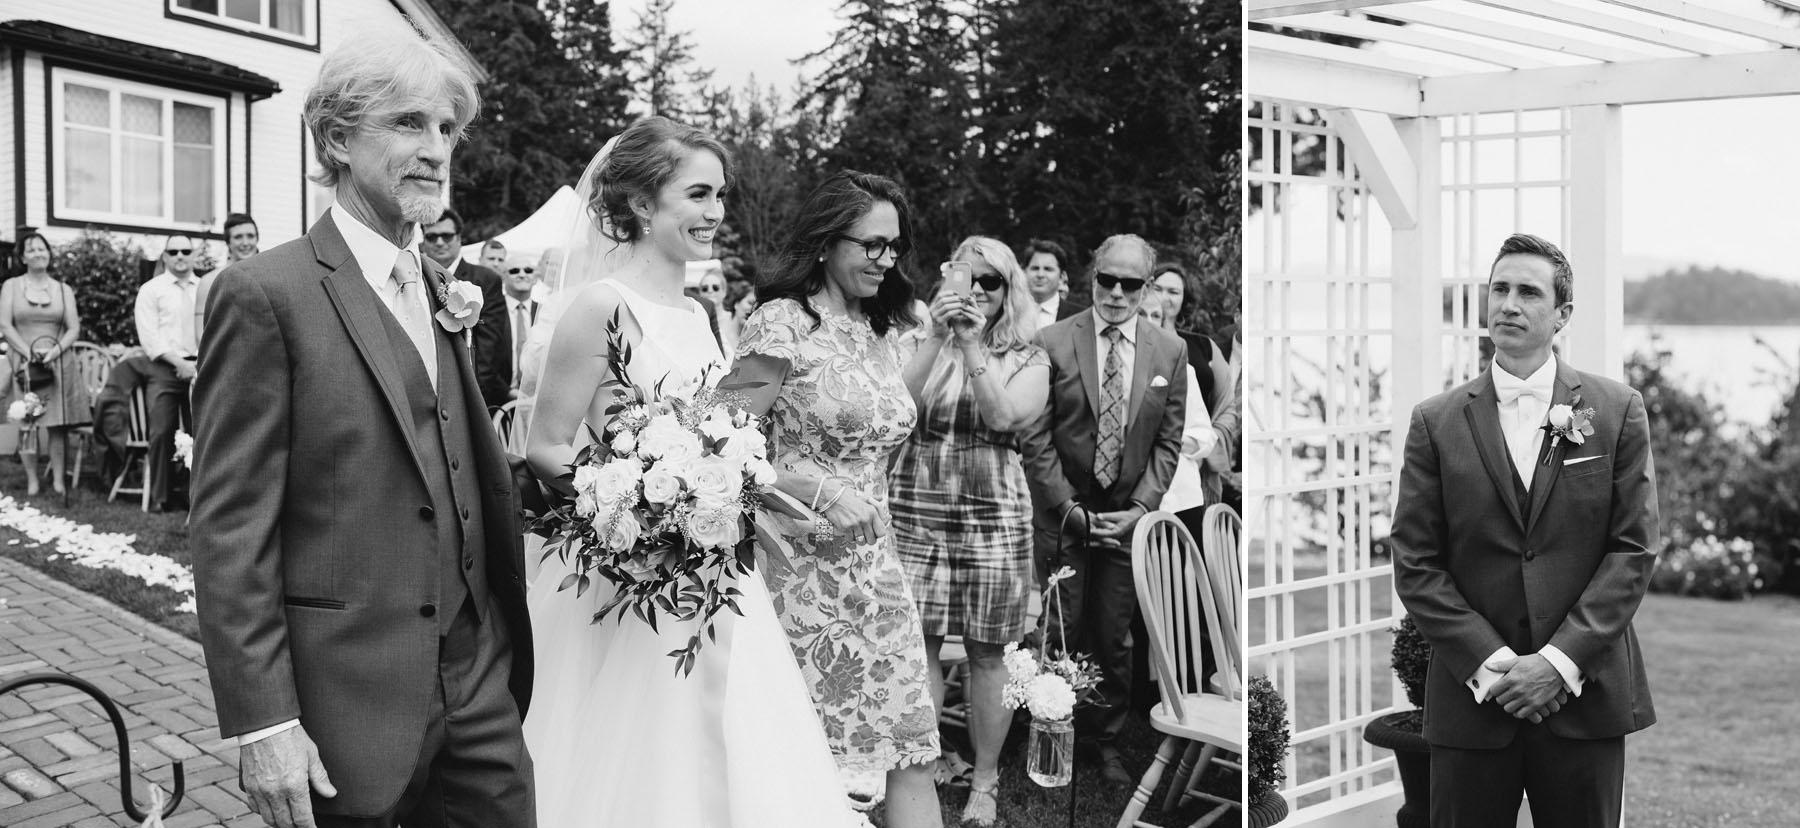 thetis-island-wedding-photographer-rp-rn-074.jpg